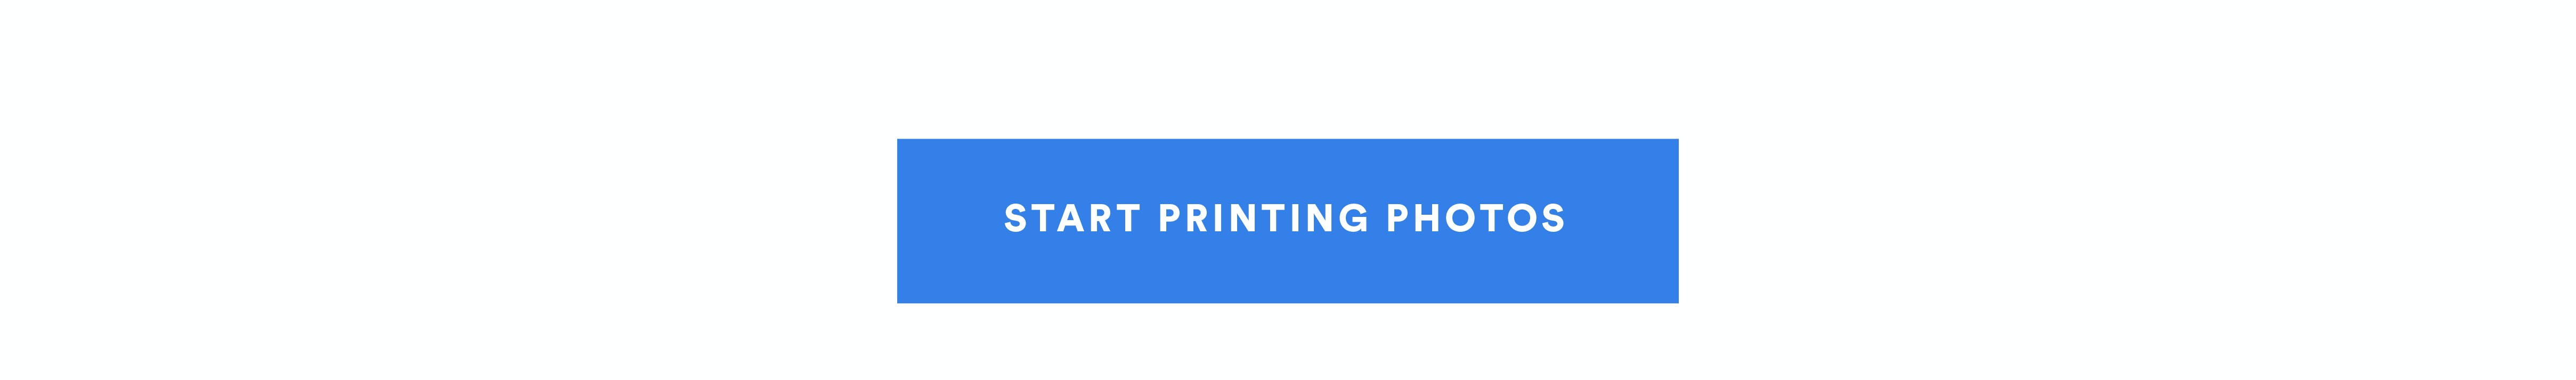 Start printing photos